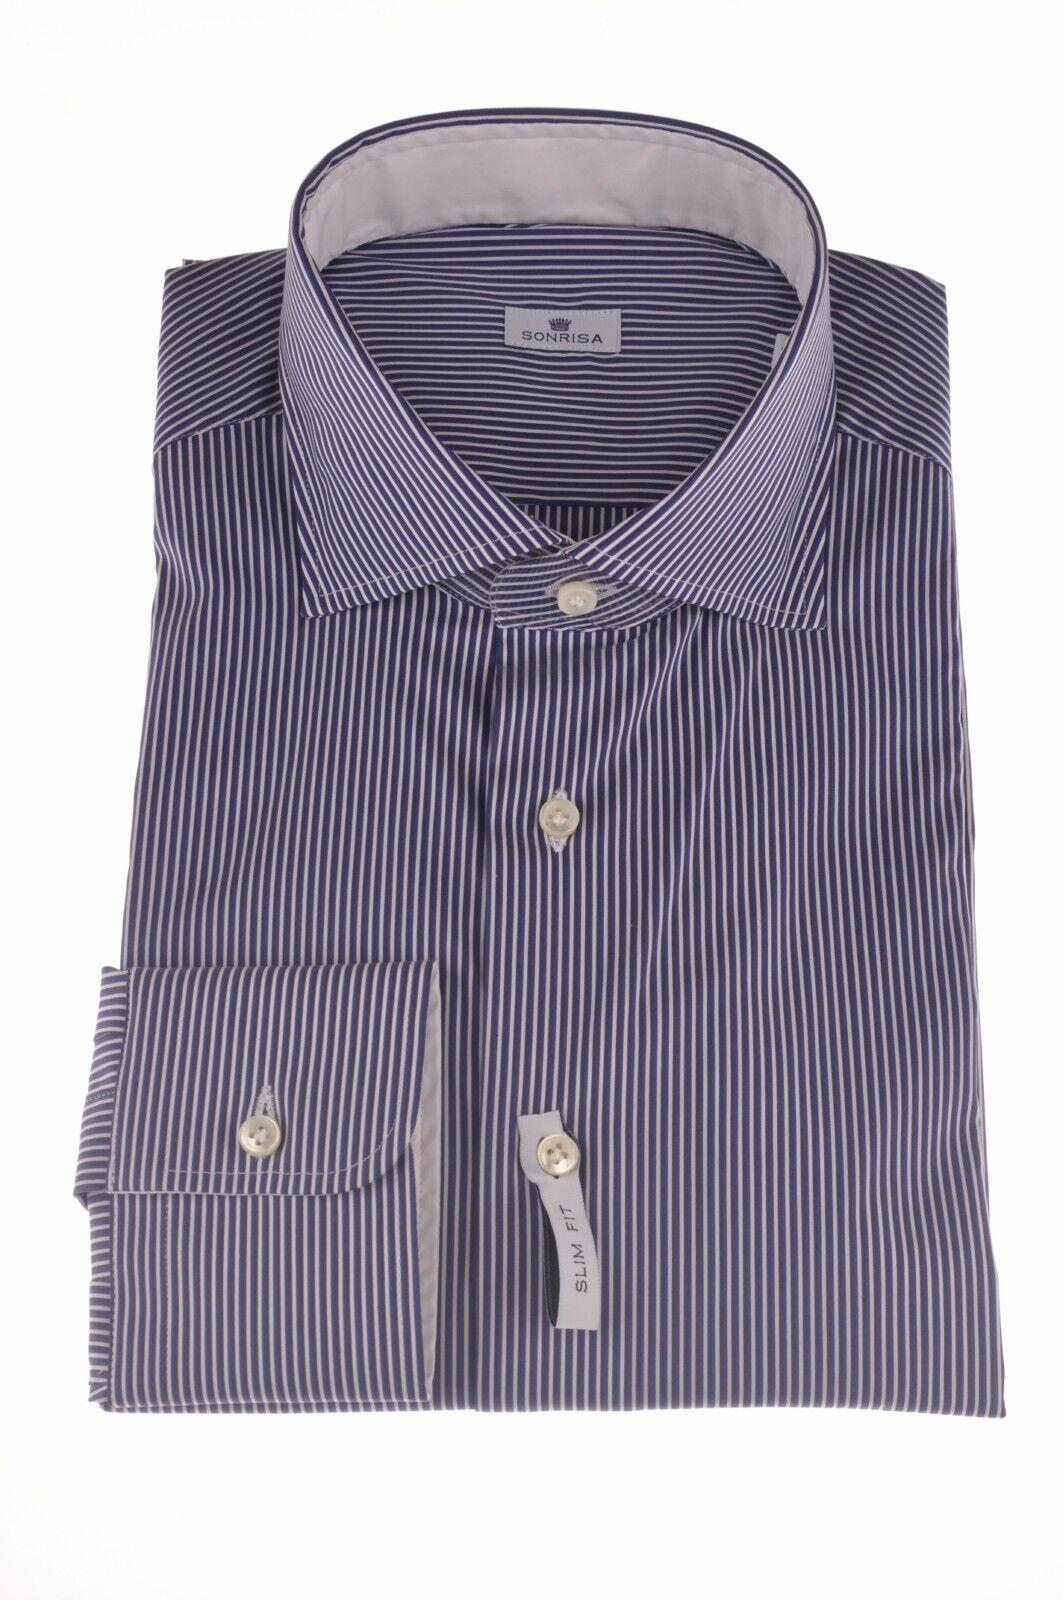 Sonrisa  -  Shirts - male - bluee - 233826A180947